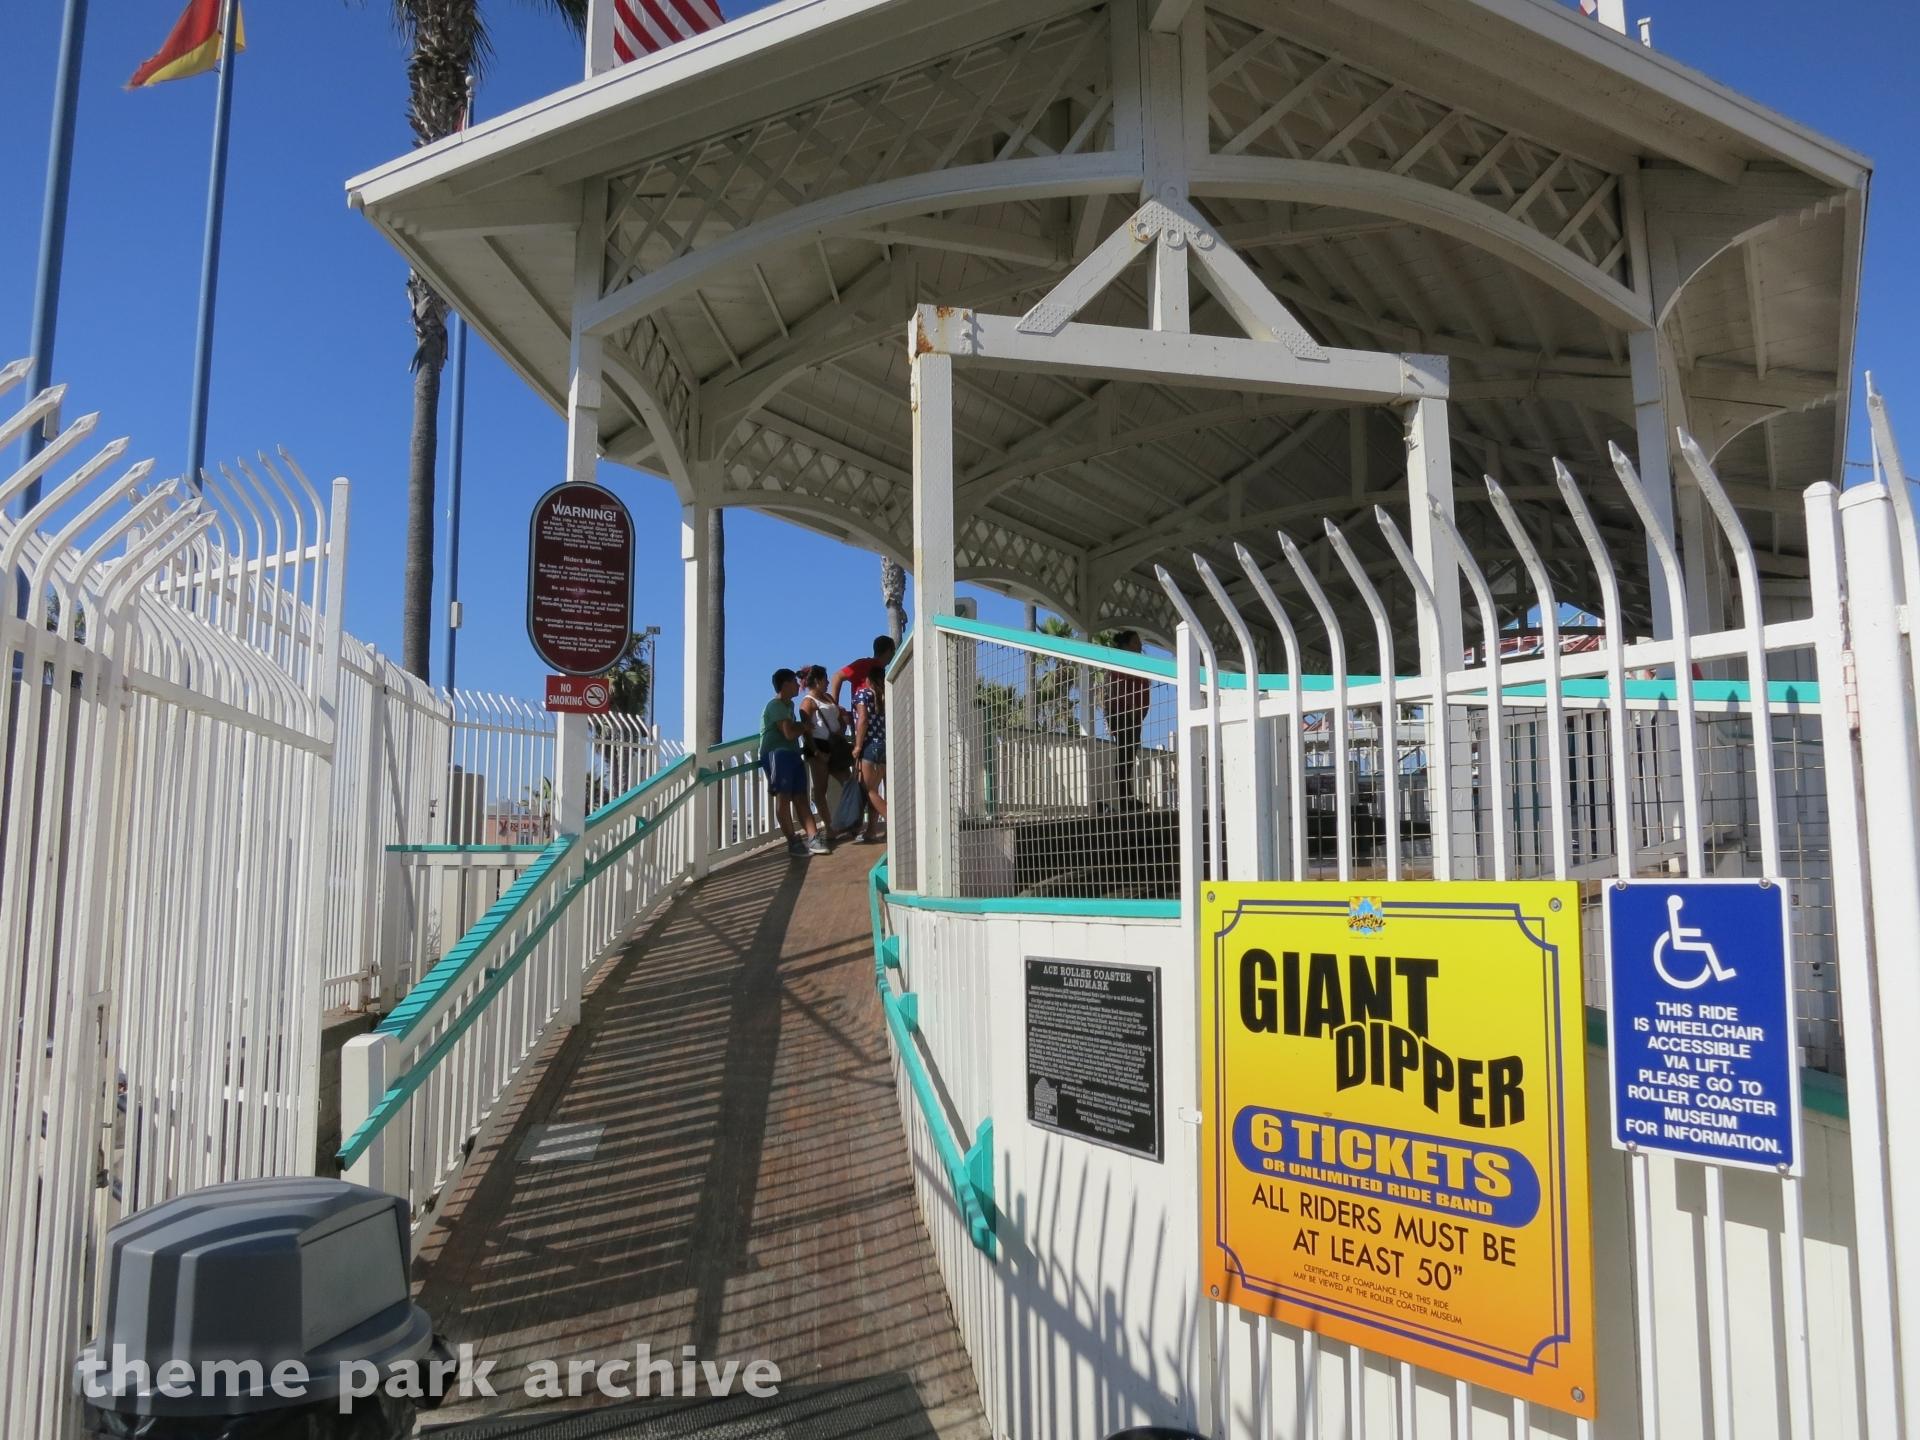 Giant Dipper at Belmont Park